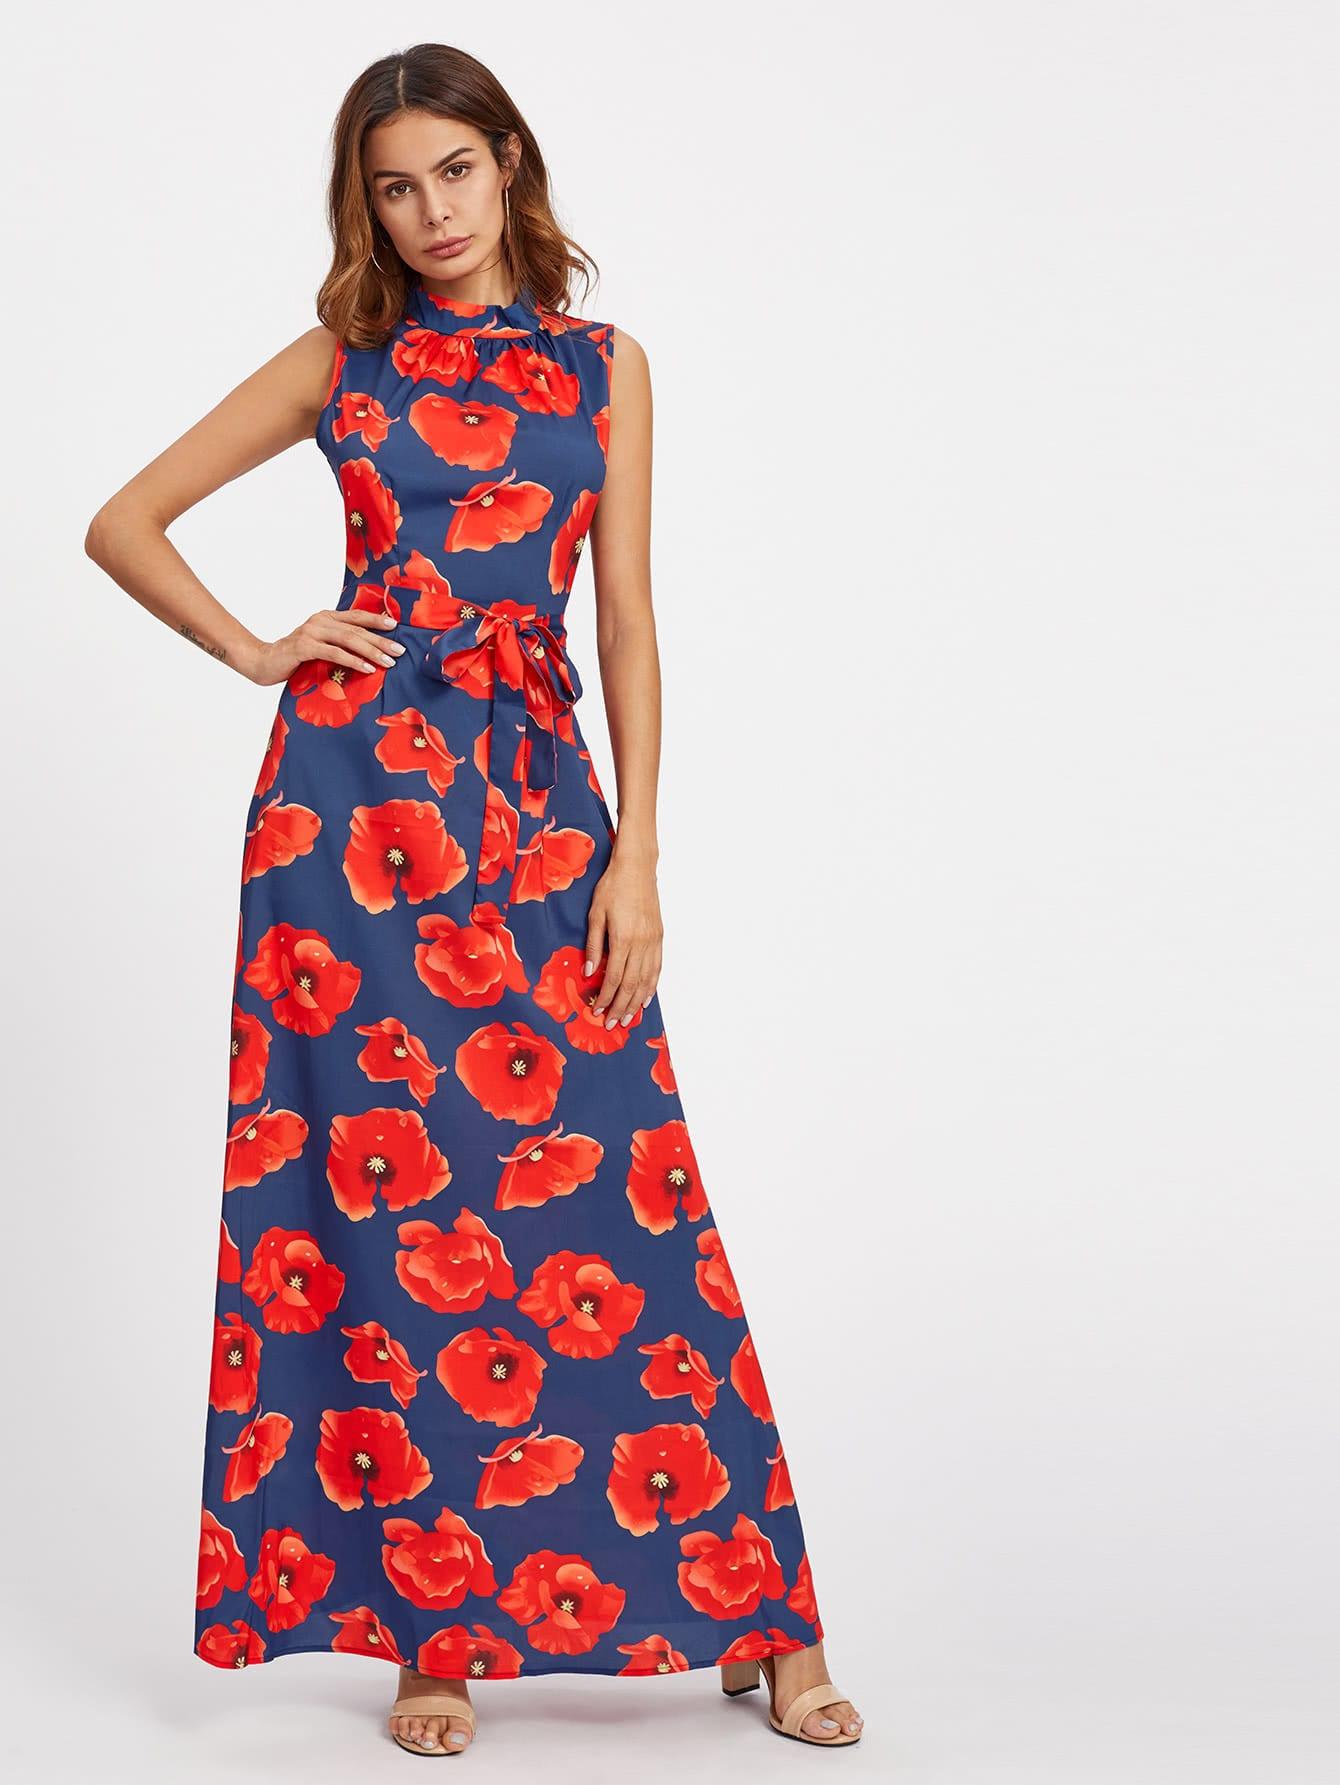 All Over Florals Self Tie Full Length Dress peter block stewardship choosing service over self interest